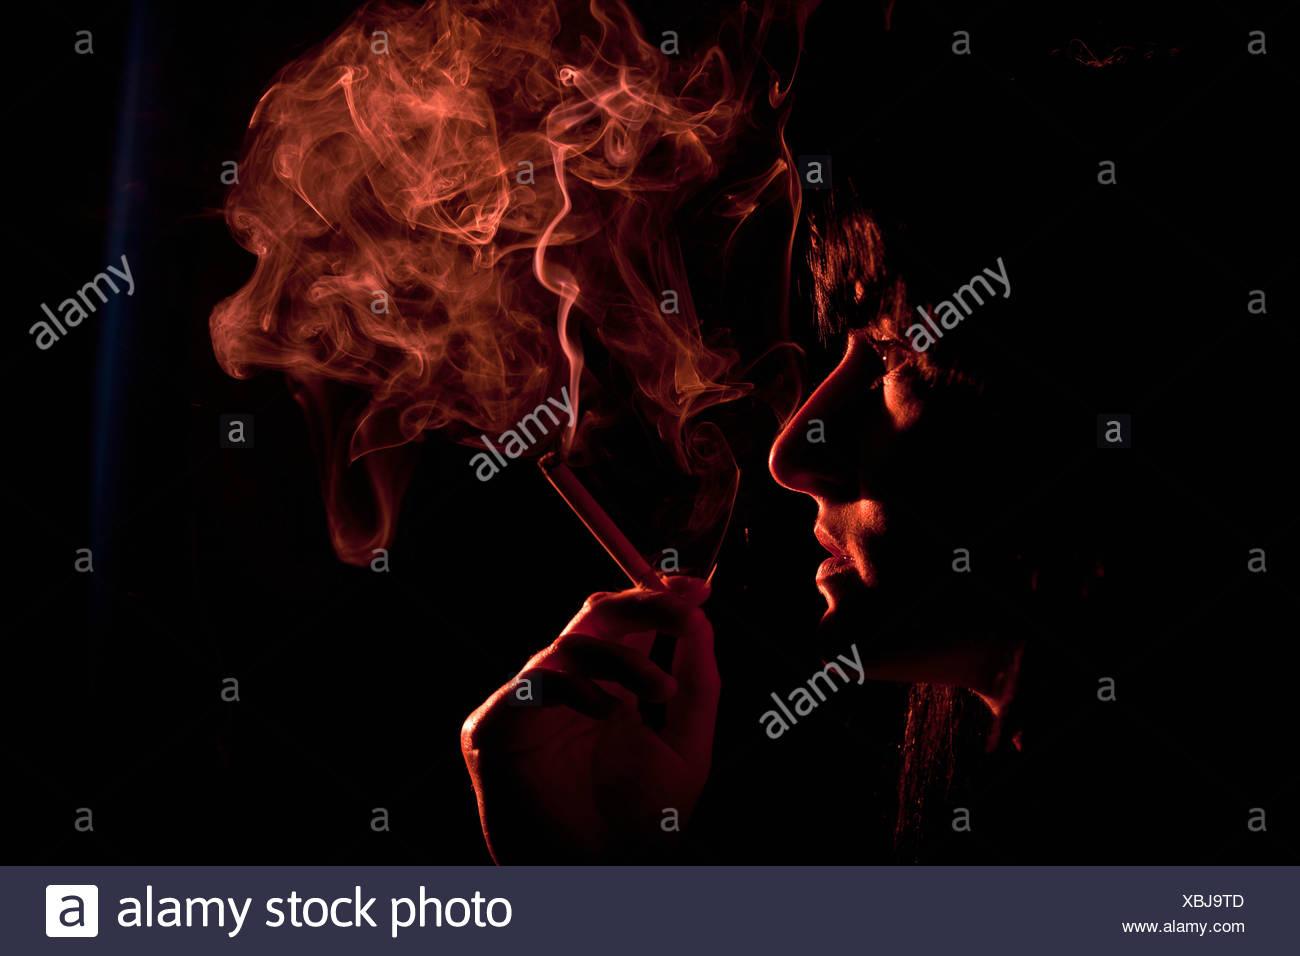 Illuminated profile of woman smoking - Stock Image